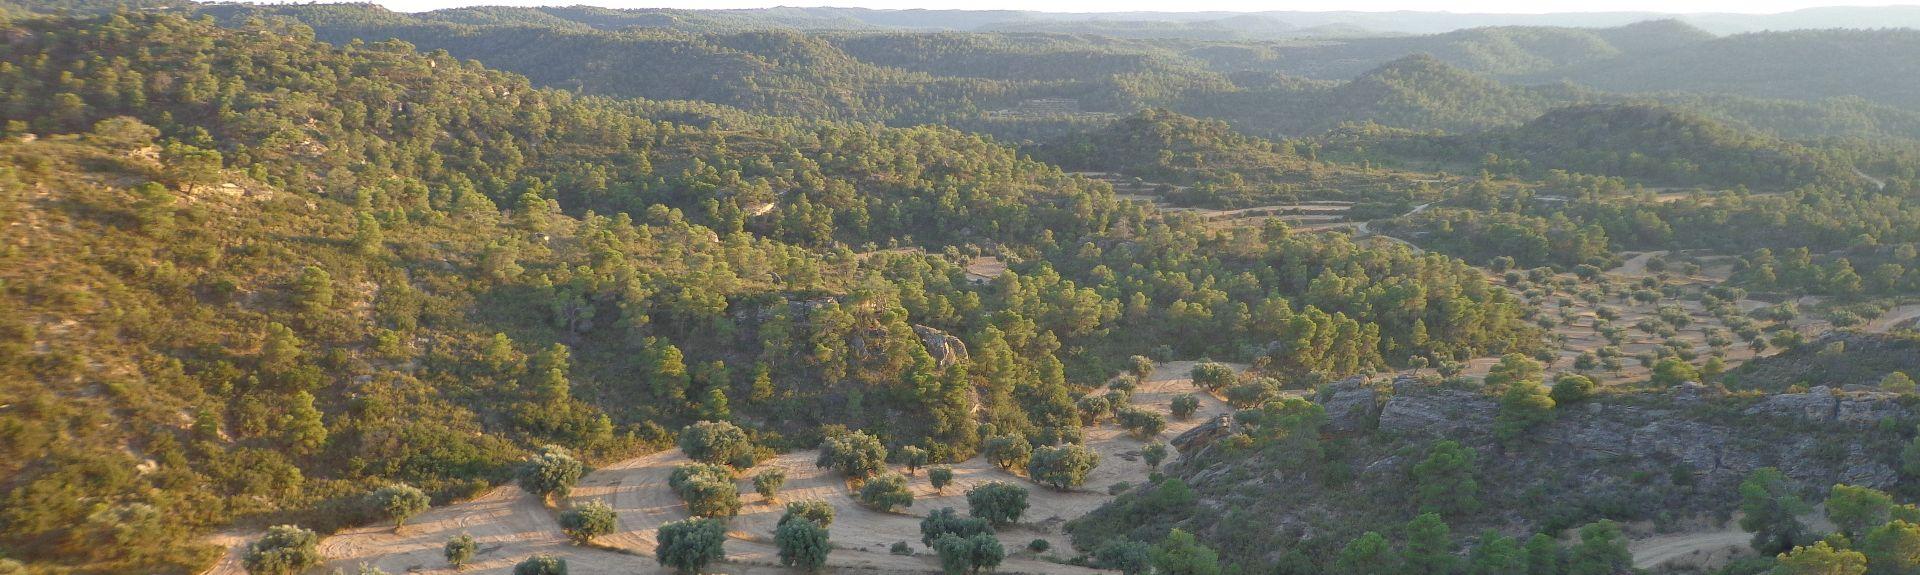 Motorland Aragon, Alcaniz, Aragon, Spain